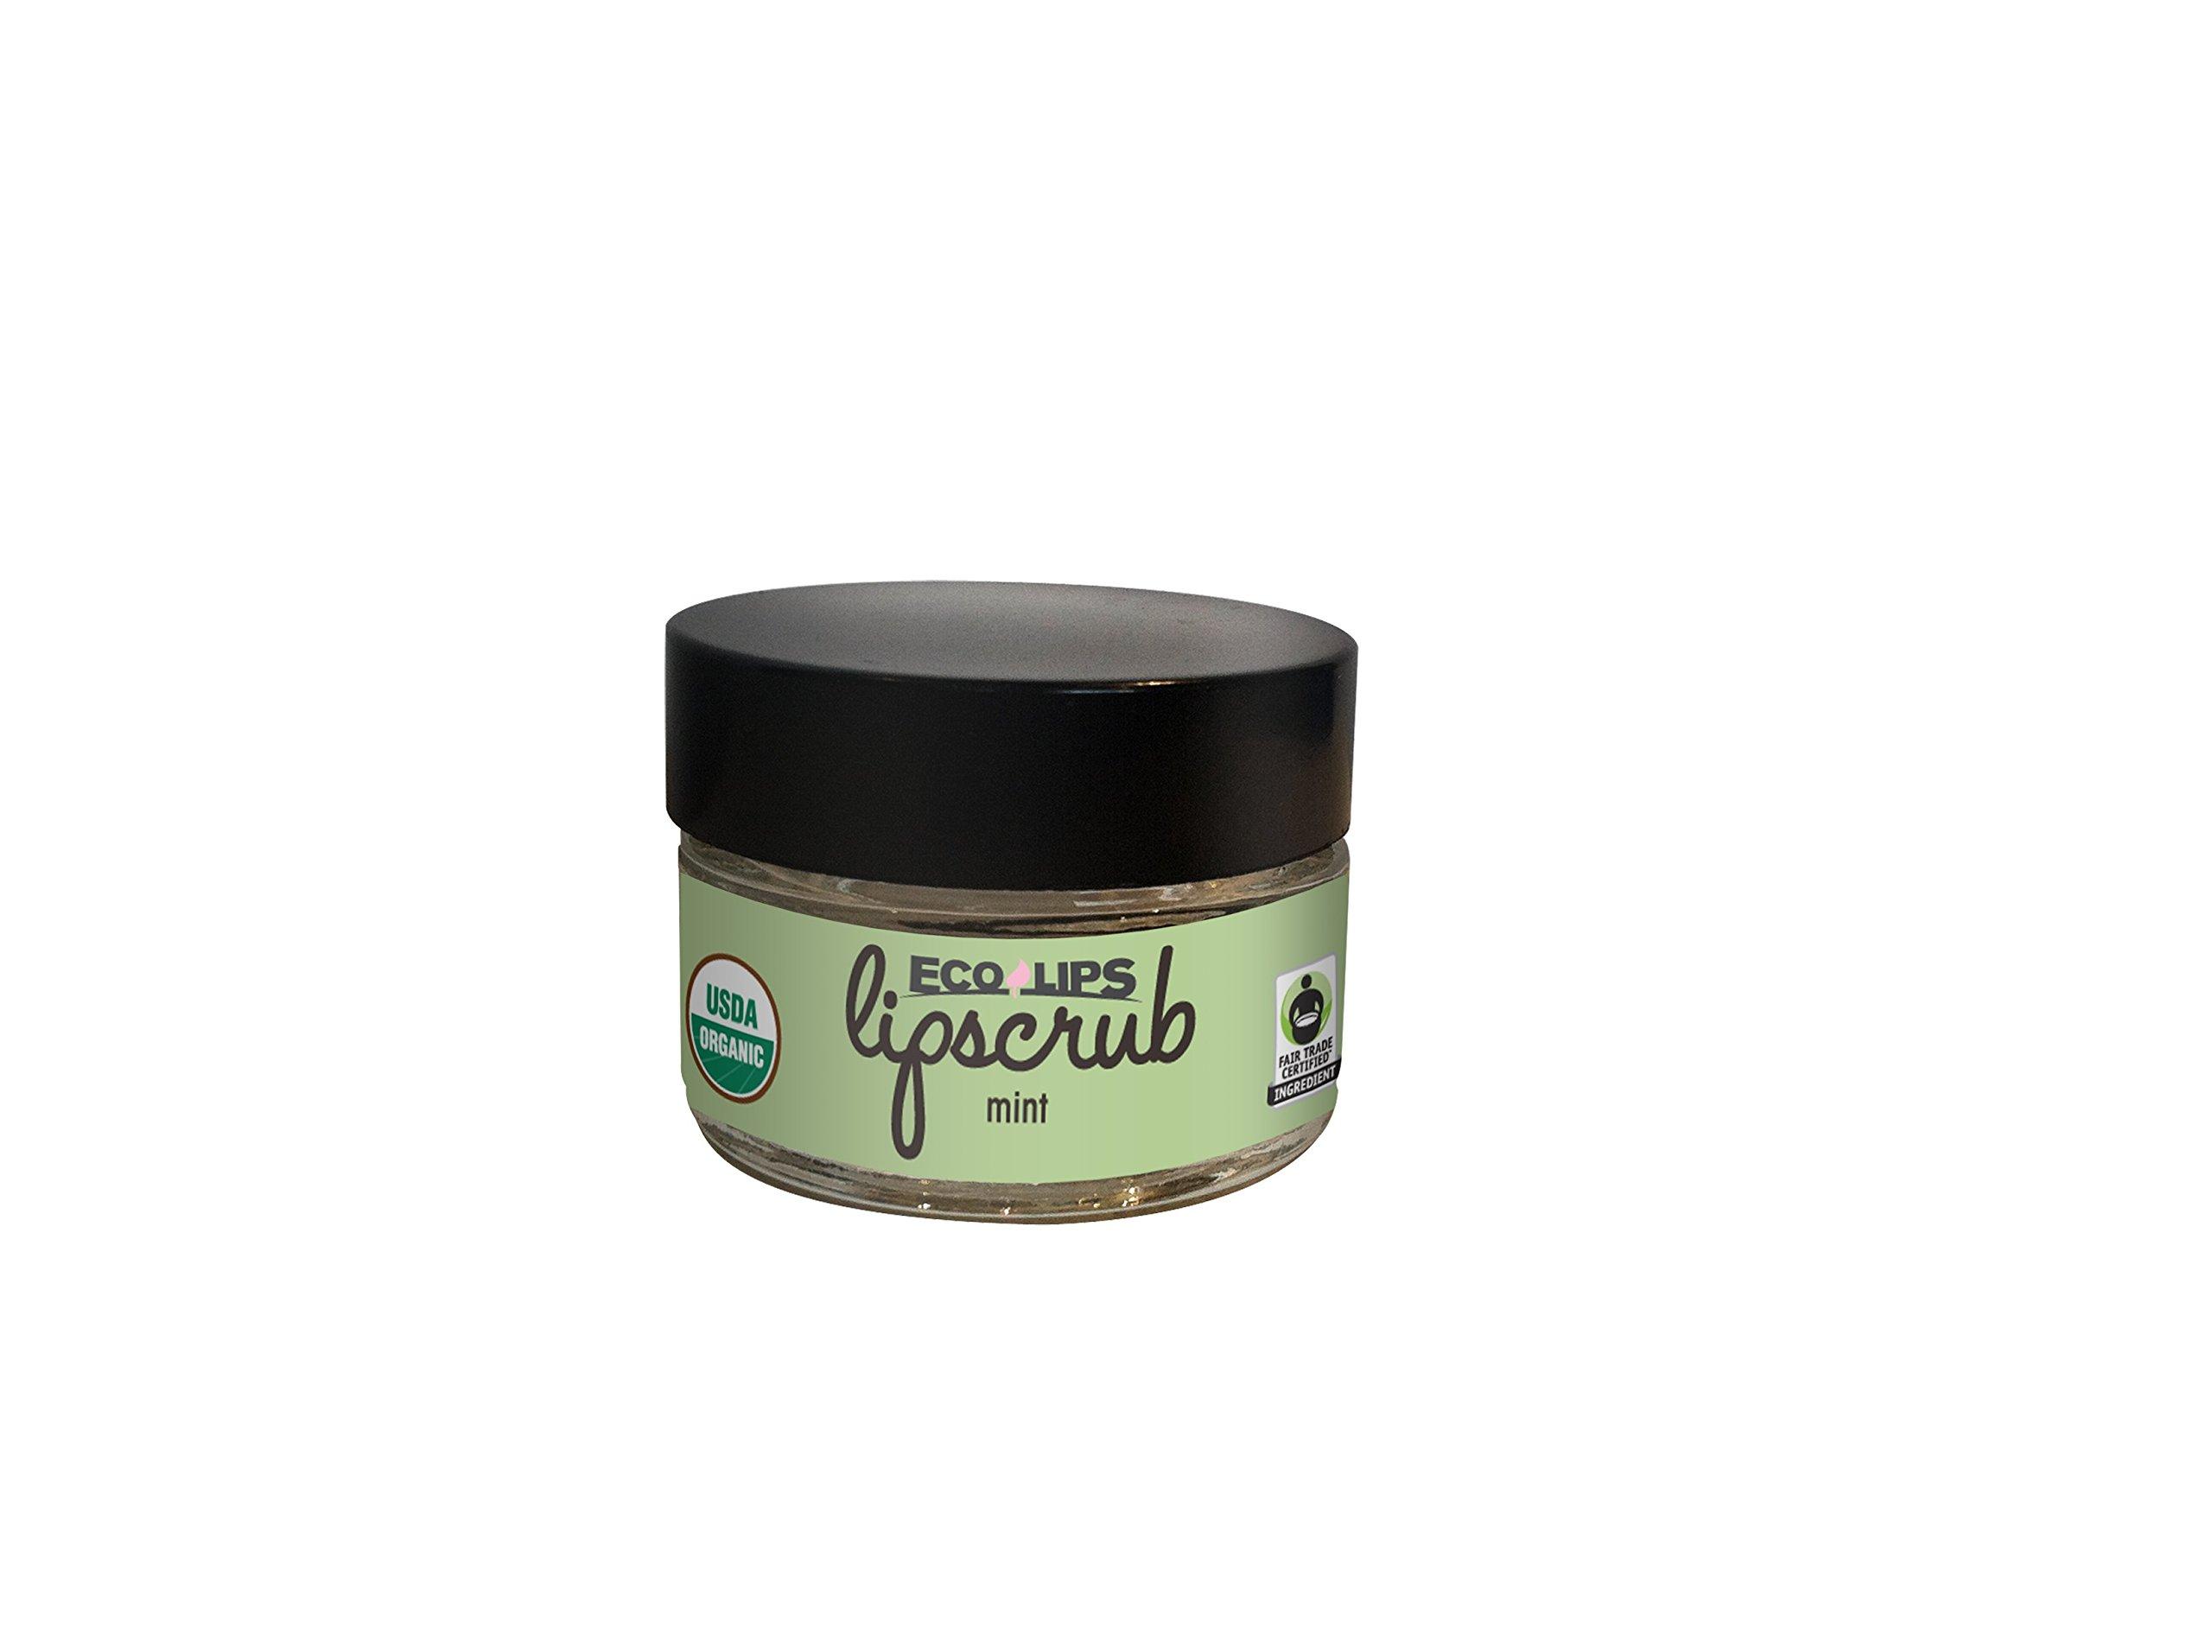 Eco Lips LIP SUGAR SCRUB 2 Pack (2- 0.5oz jars) 100% Organic Lip Care Treatment with Organic Sugar & Coconut Oil - Gently Exfoliate & Polish Dry, Flaky Lips, 100% Edible (Mint)